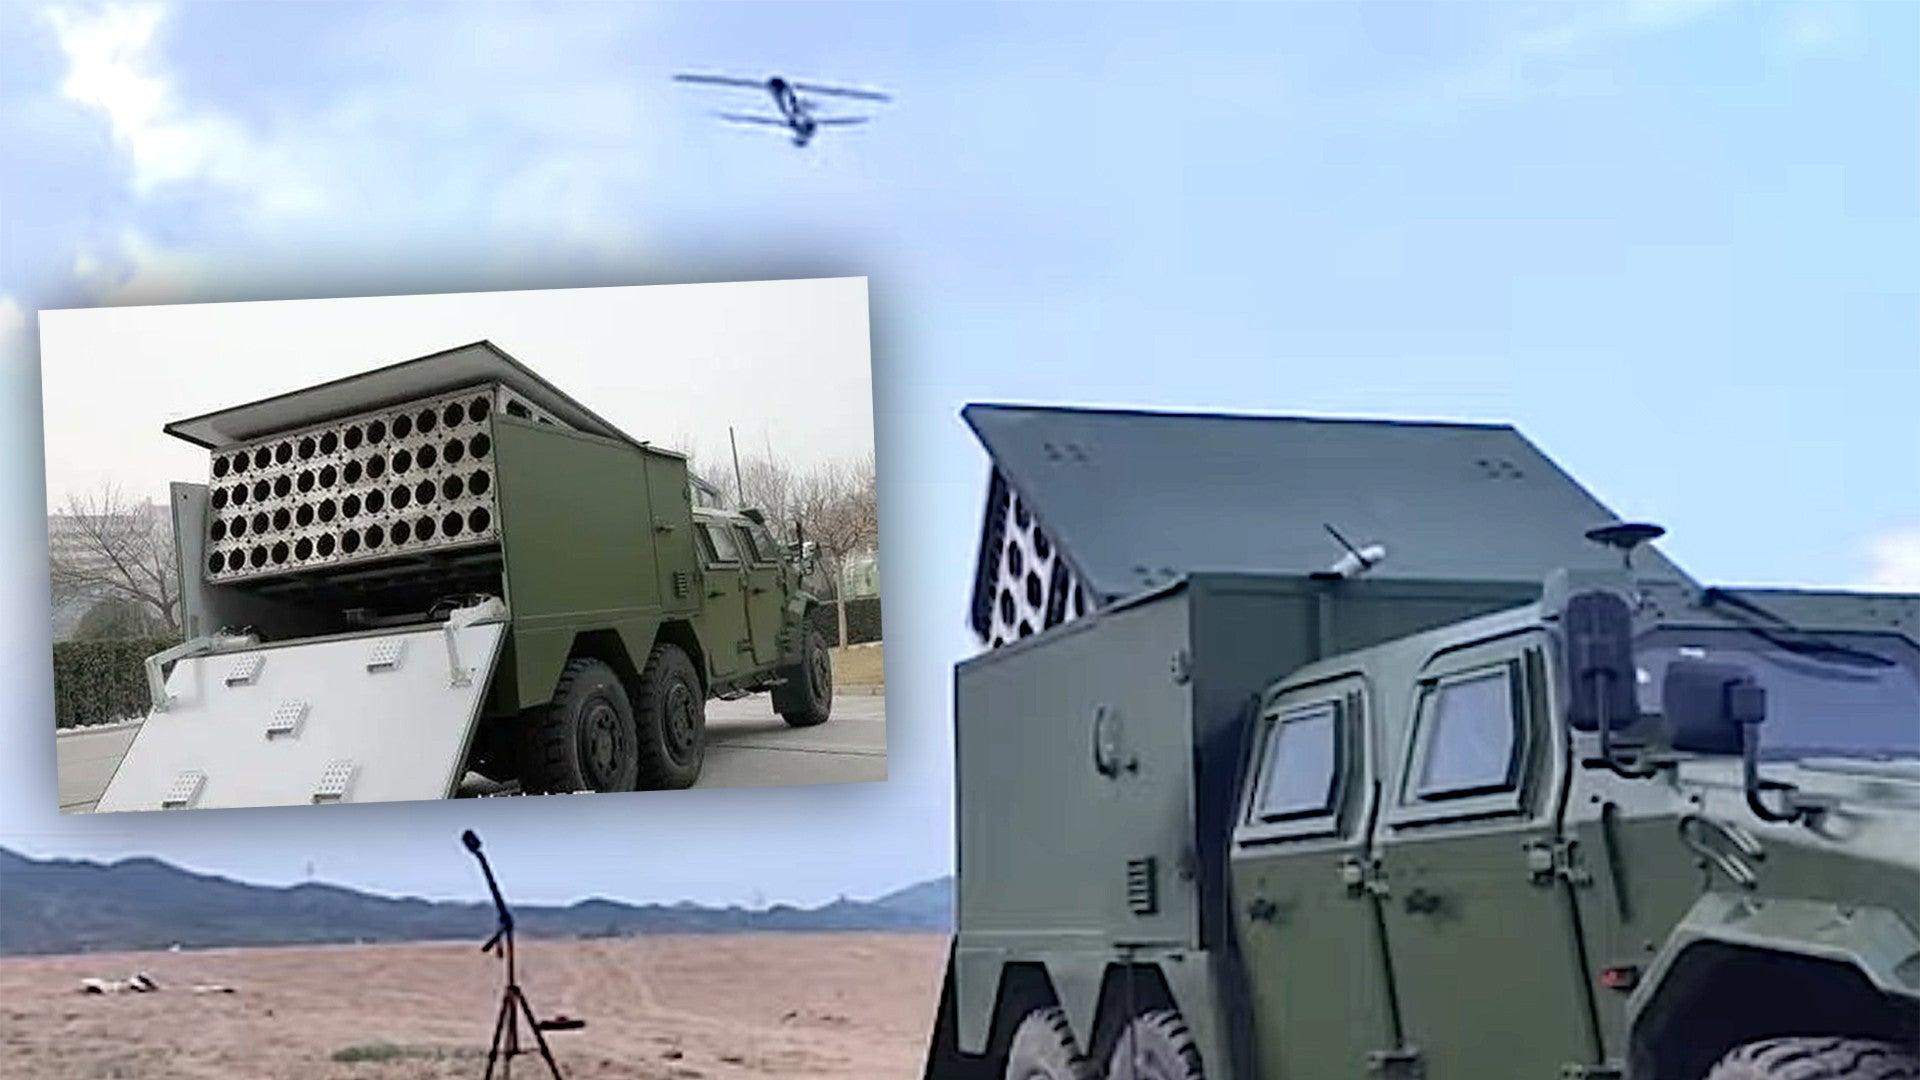 To μελλοντικό πρόσωπο του πολέμου-Η Κίνα παρουσίασε τεχνολογία εκτόξευσης σμήνους drone από εκτοξευτή τοποθετημένο σε φορτηγό όχημα